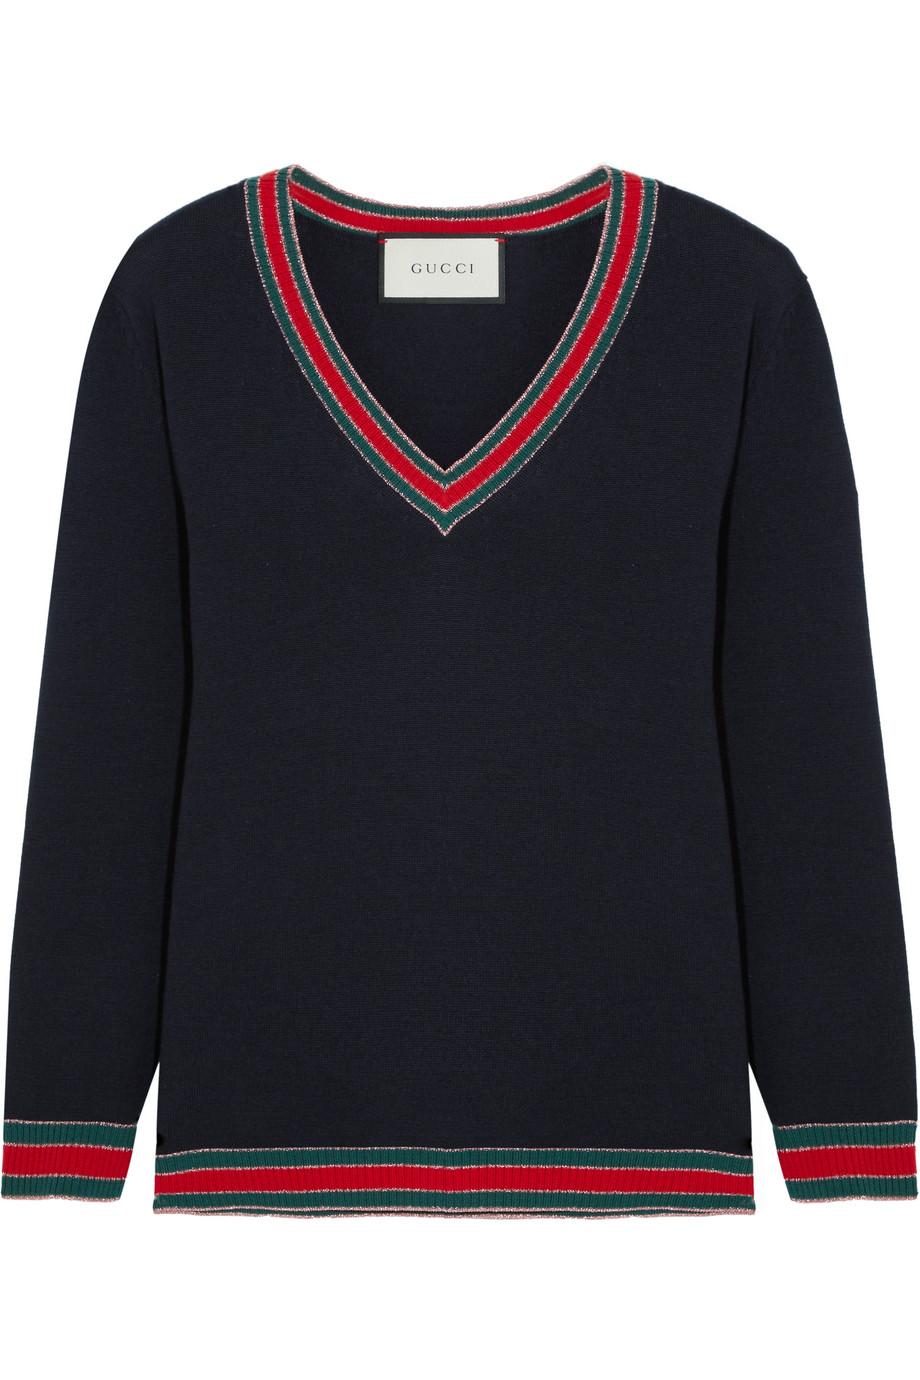 Gucci Stripe-Trimmed Wool Sweater, Midnight Blue, Women's, Size: XL